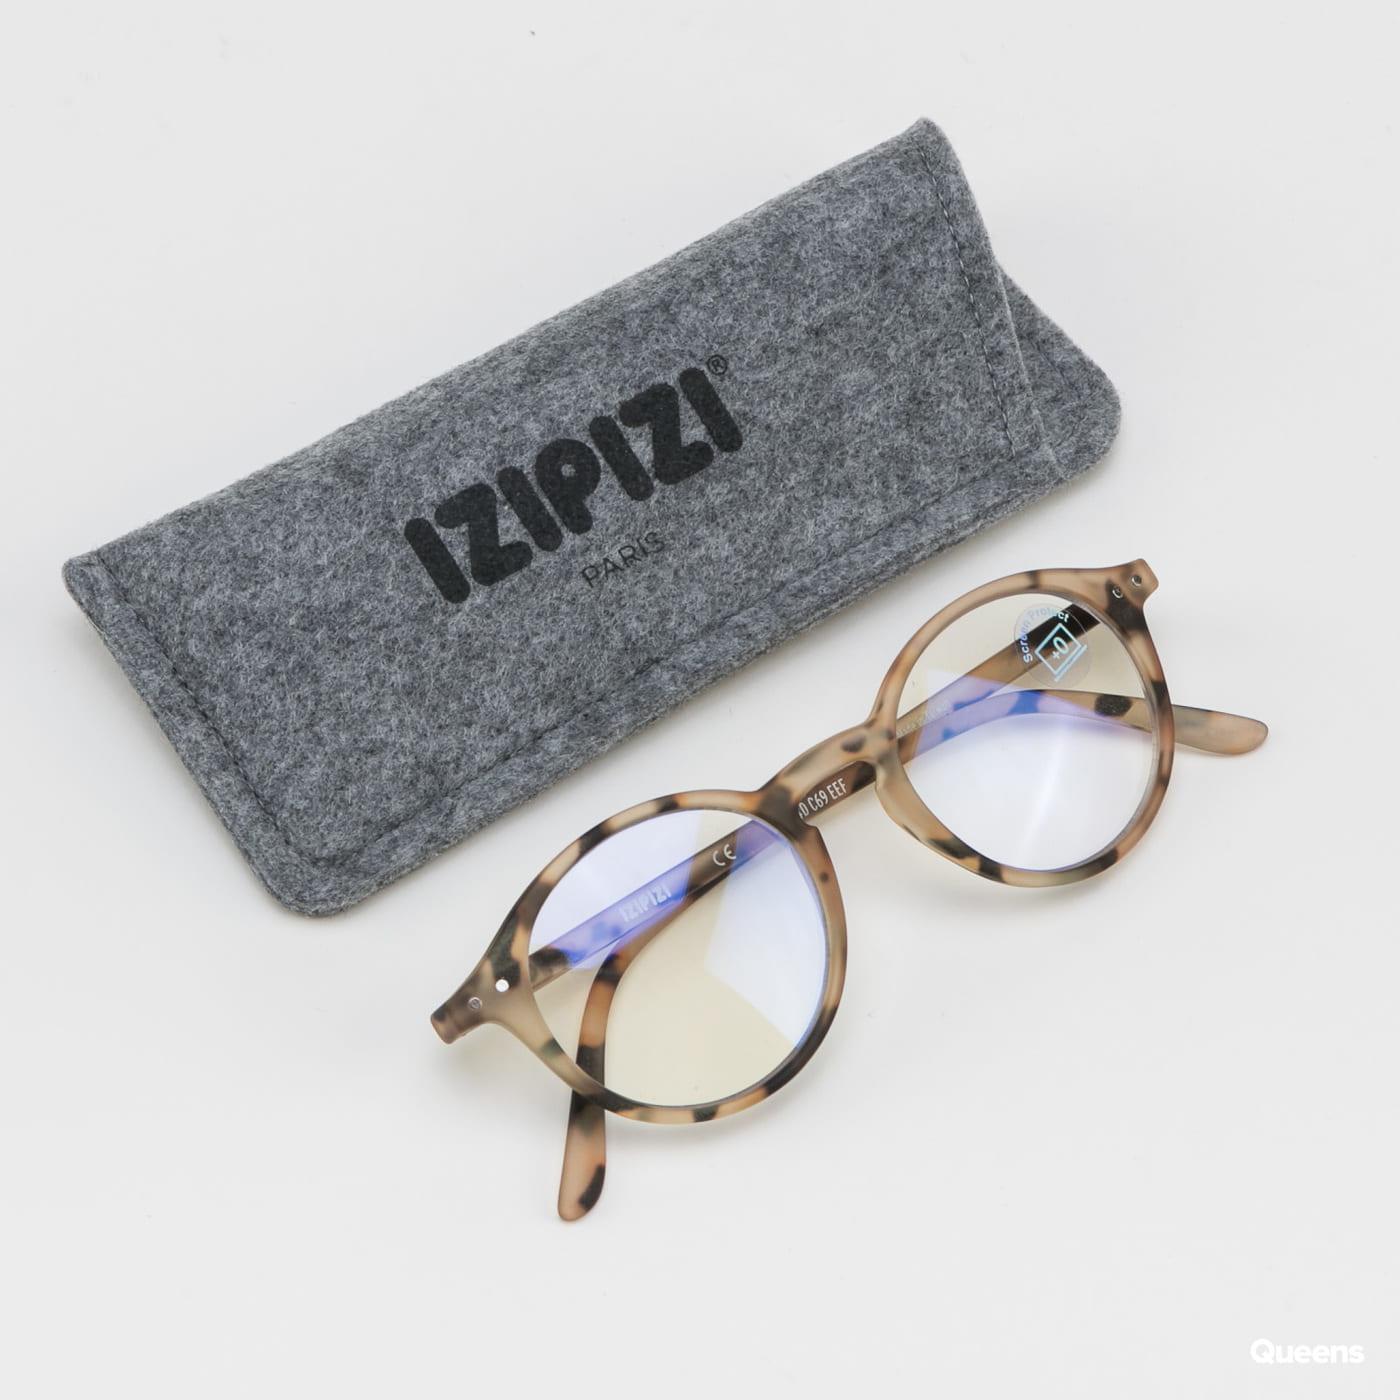 IZIPIZI Screen Protect #D light beige / black / transparent